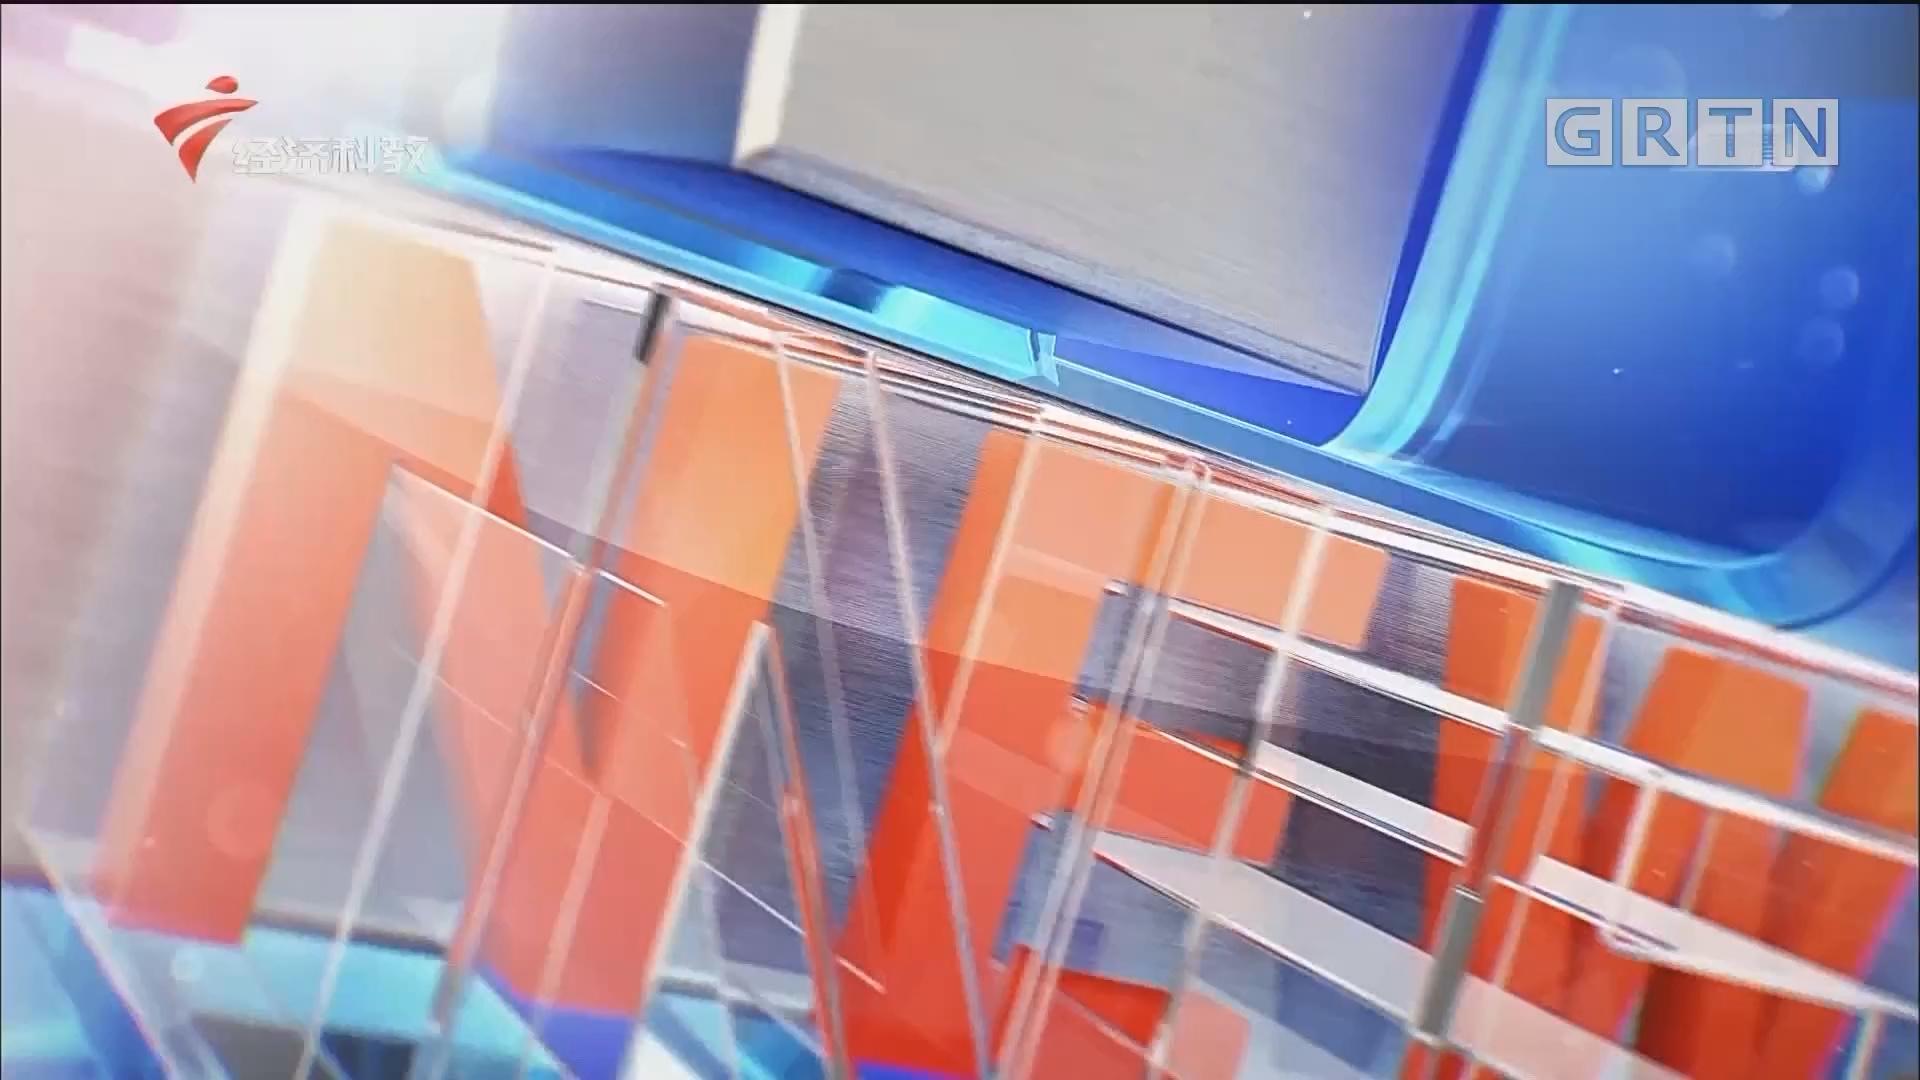 [HD][2020-02-12]南方财经报道:国务院联防联控机制新闻发布会:严禁以简单粗暴方式限制企业复工复产